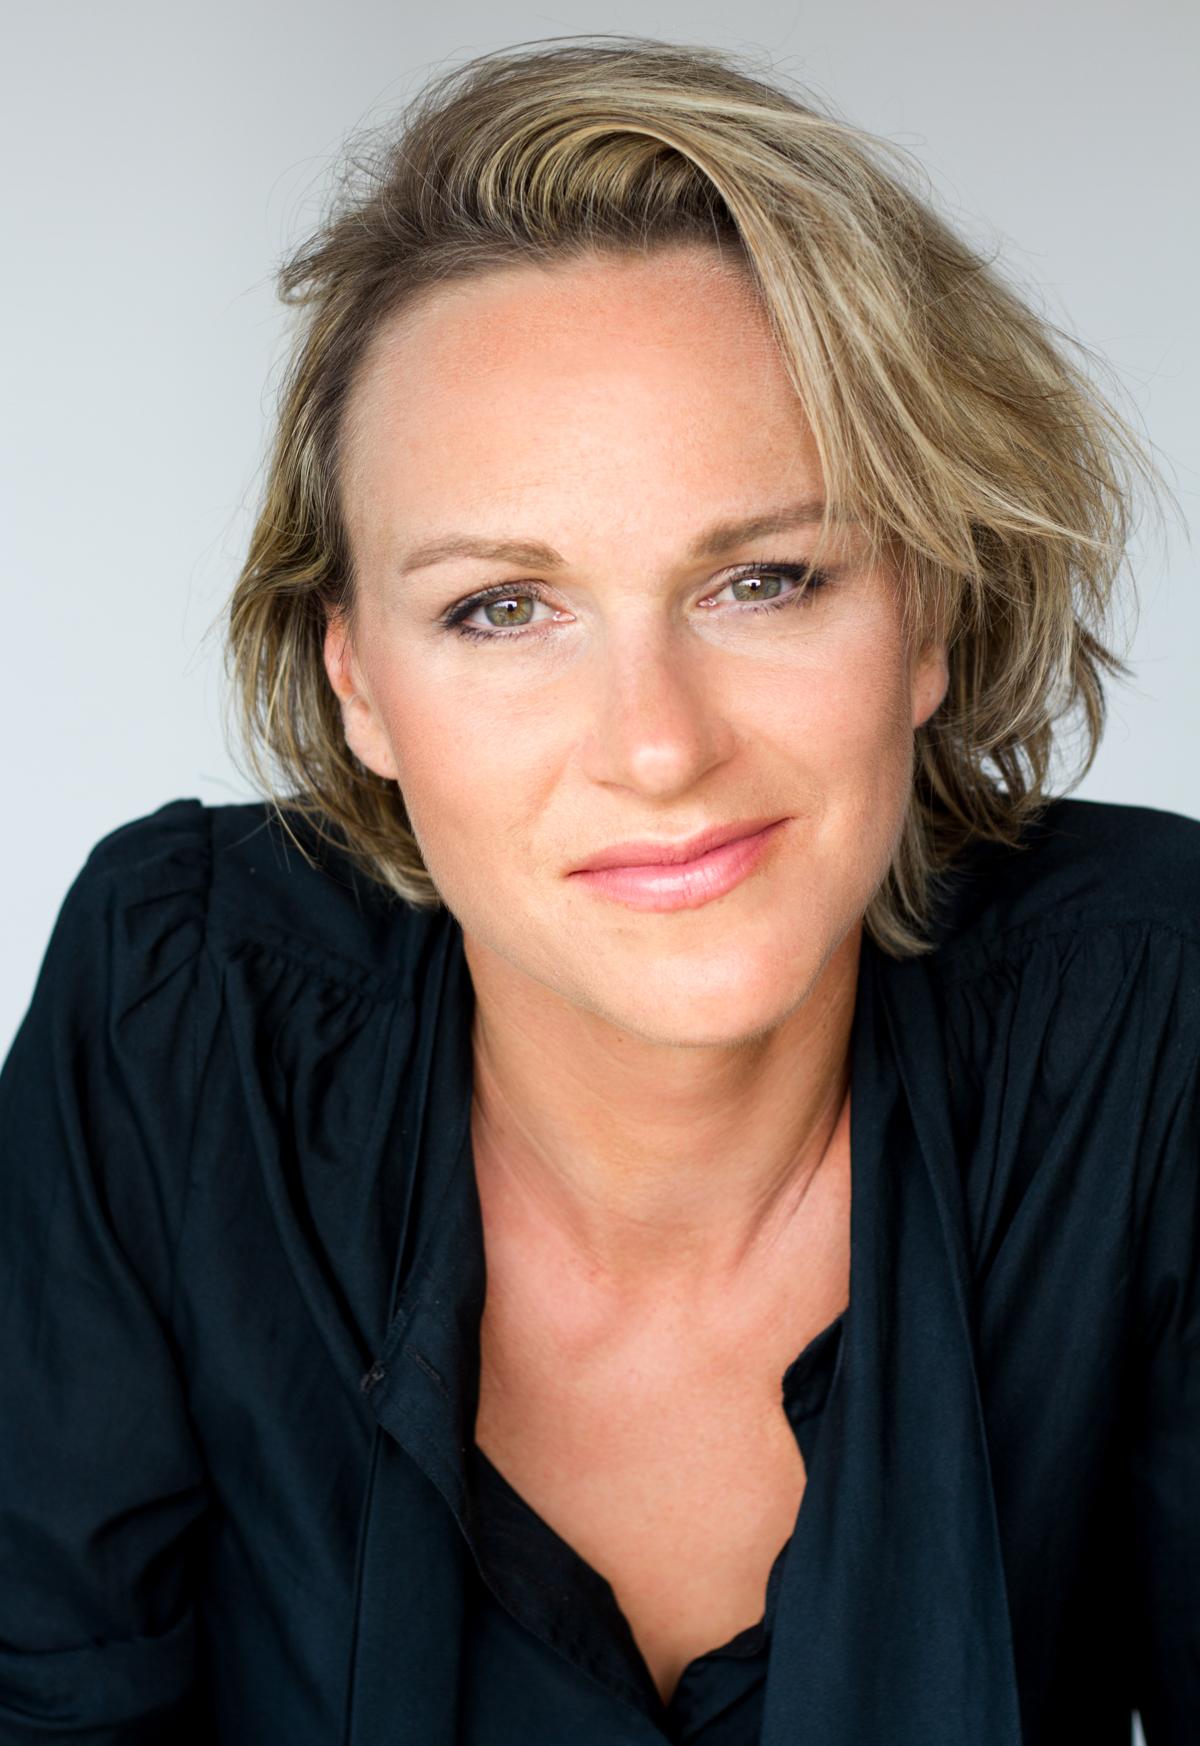 Chloe Dirksen